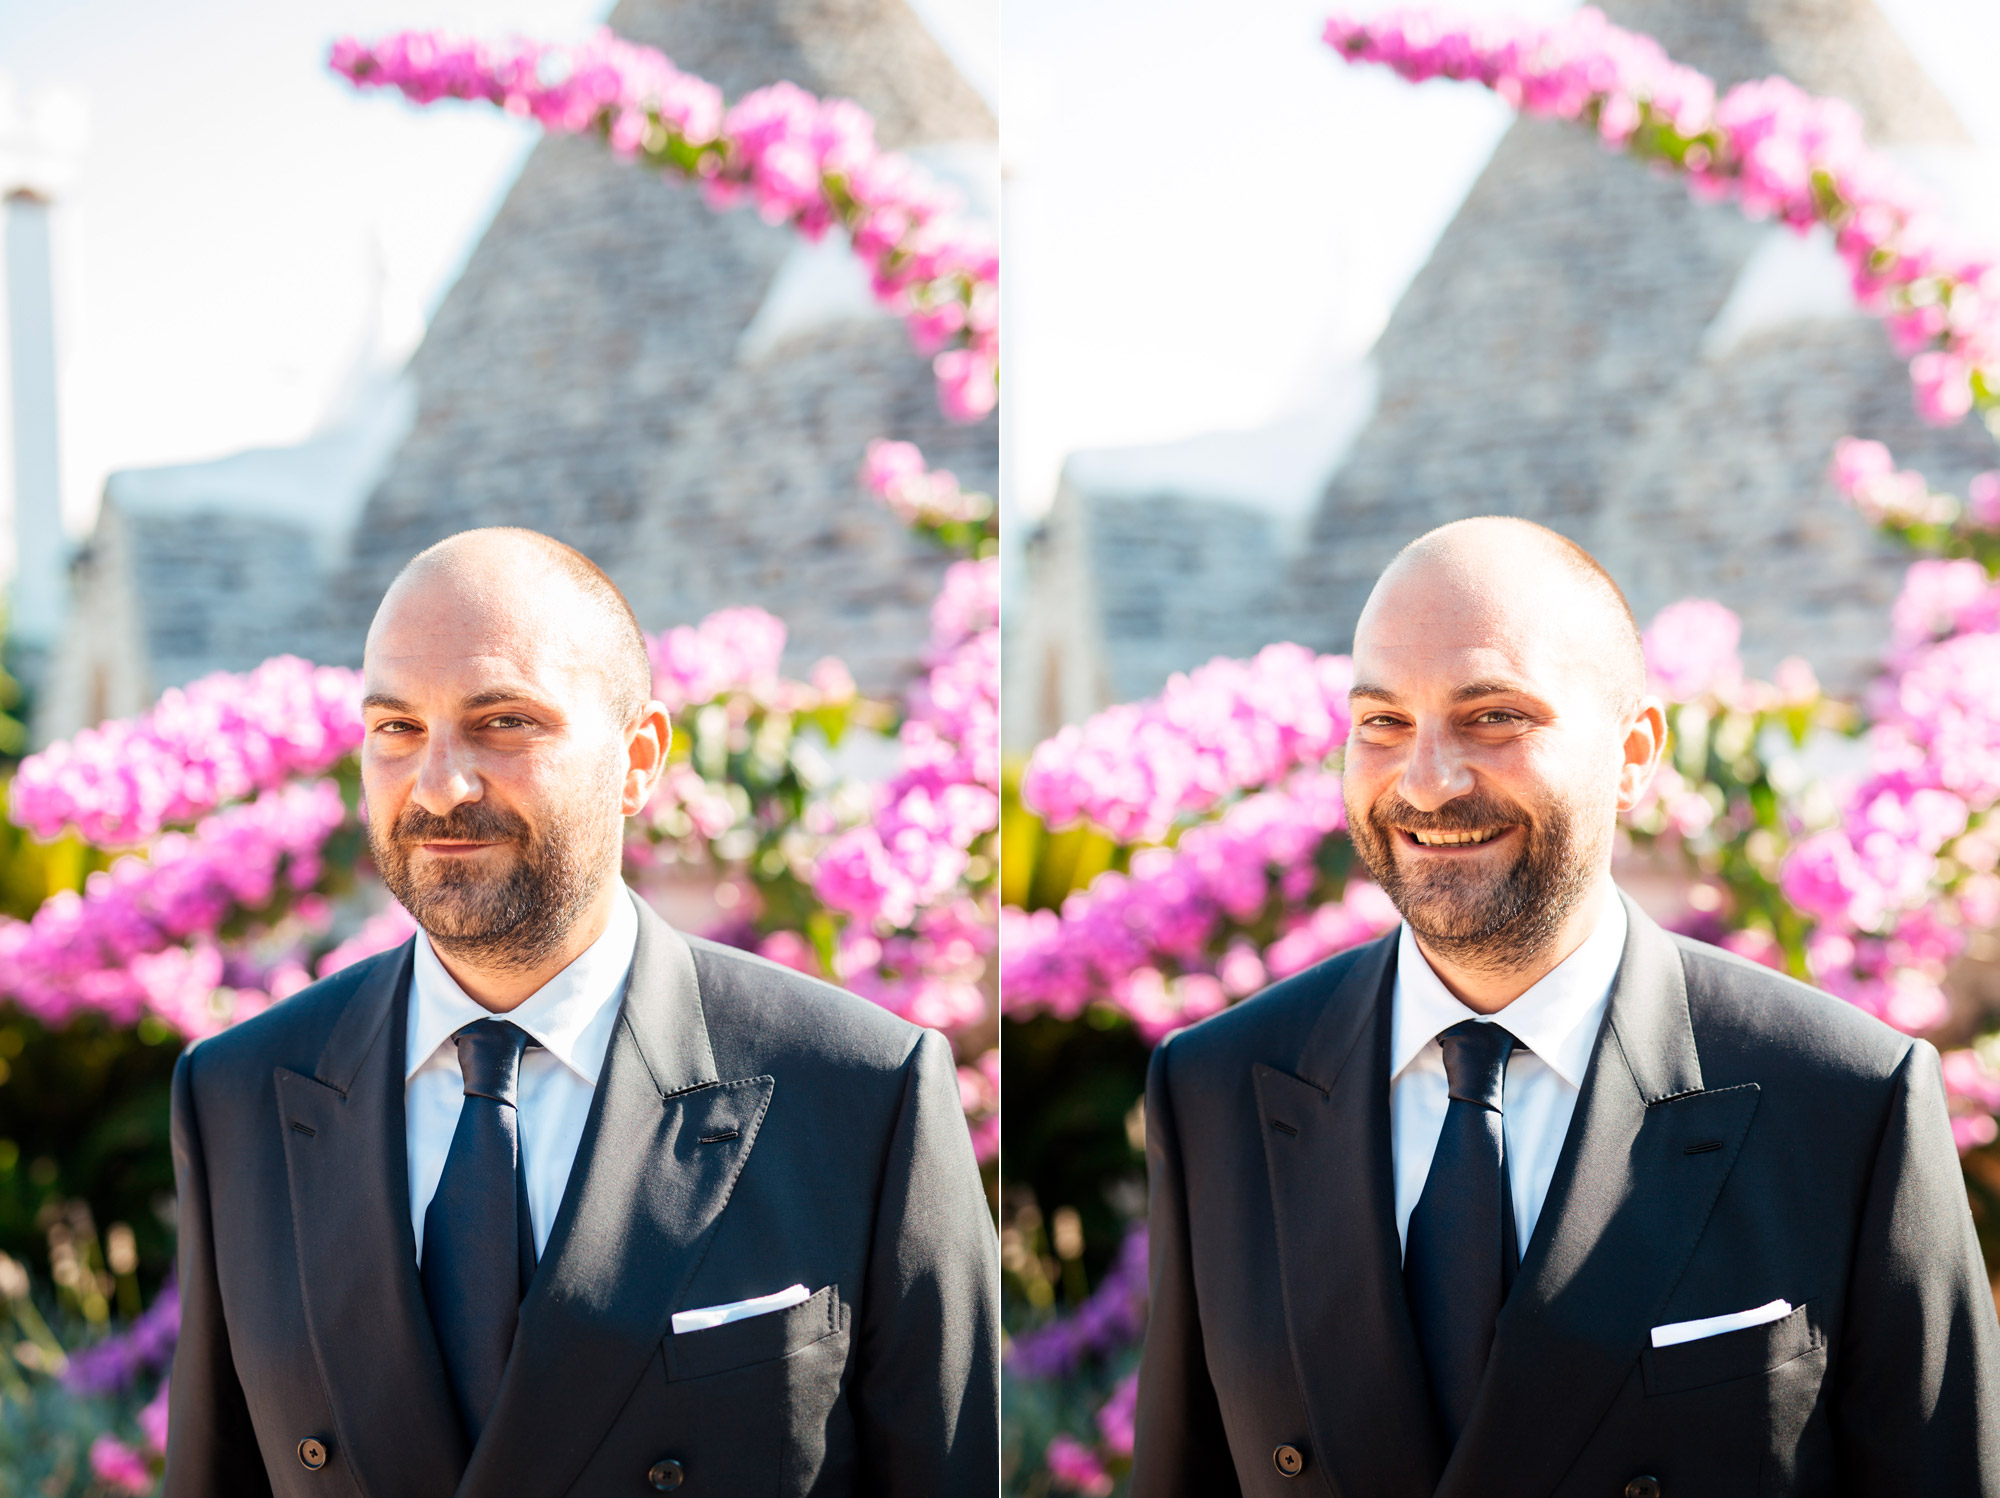 169-FIKUS-PUGLIA-wedding-ostuni-masseria.jpg